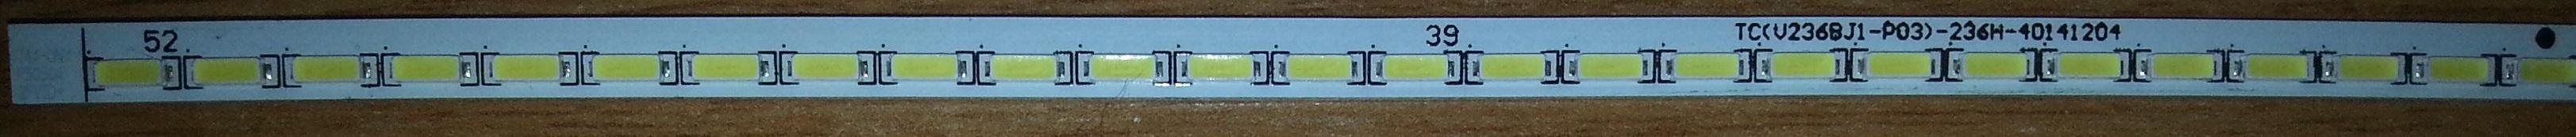 Bagheta cu 52 leduri, cod V236BJ1-P03